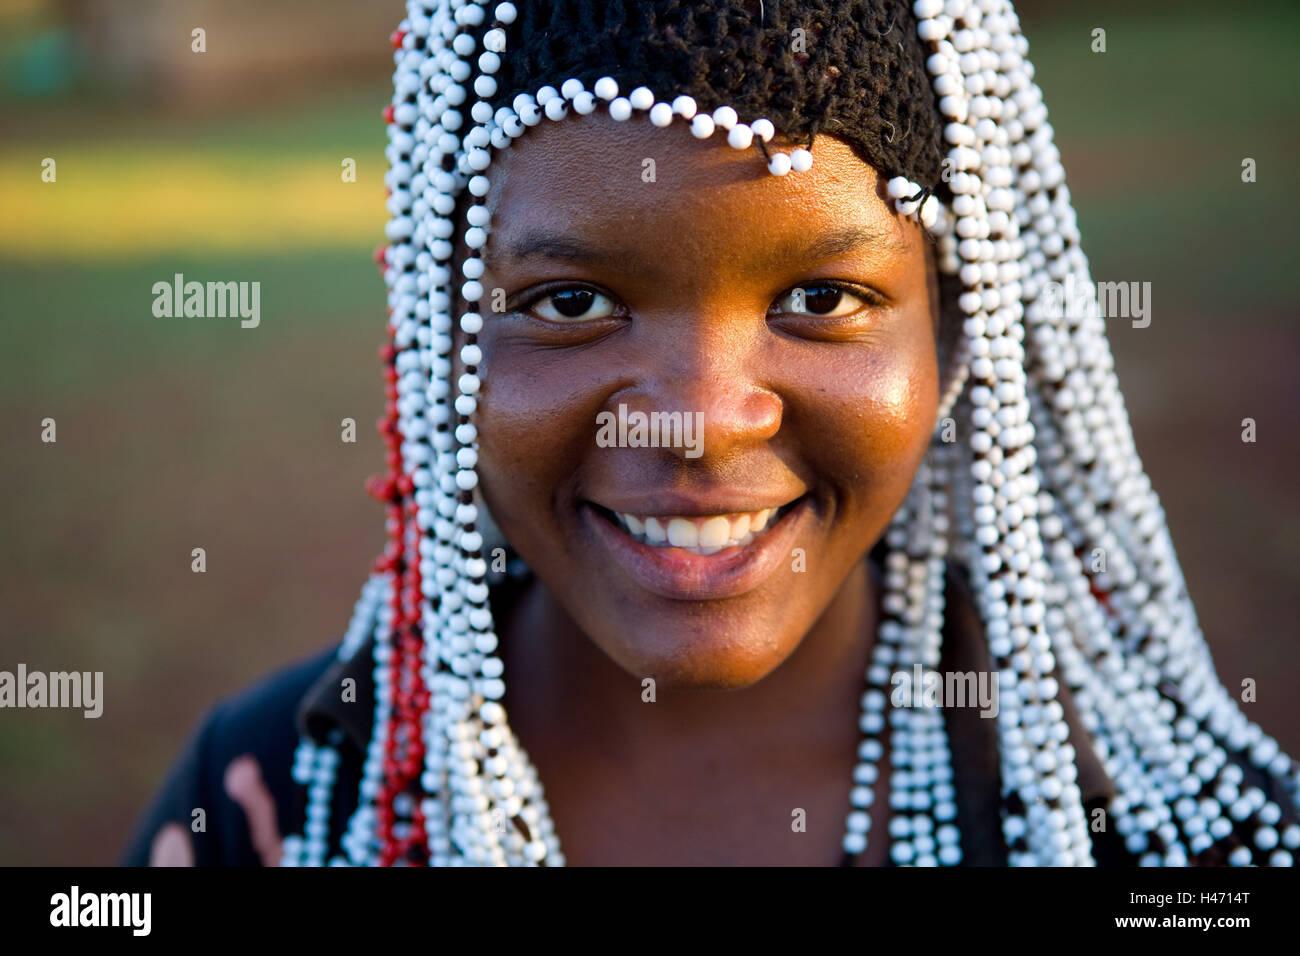 Au Sud L Afrique Le Kwazulu Natal La Tribu Zulu Fille Coiffure